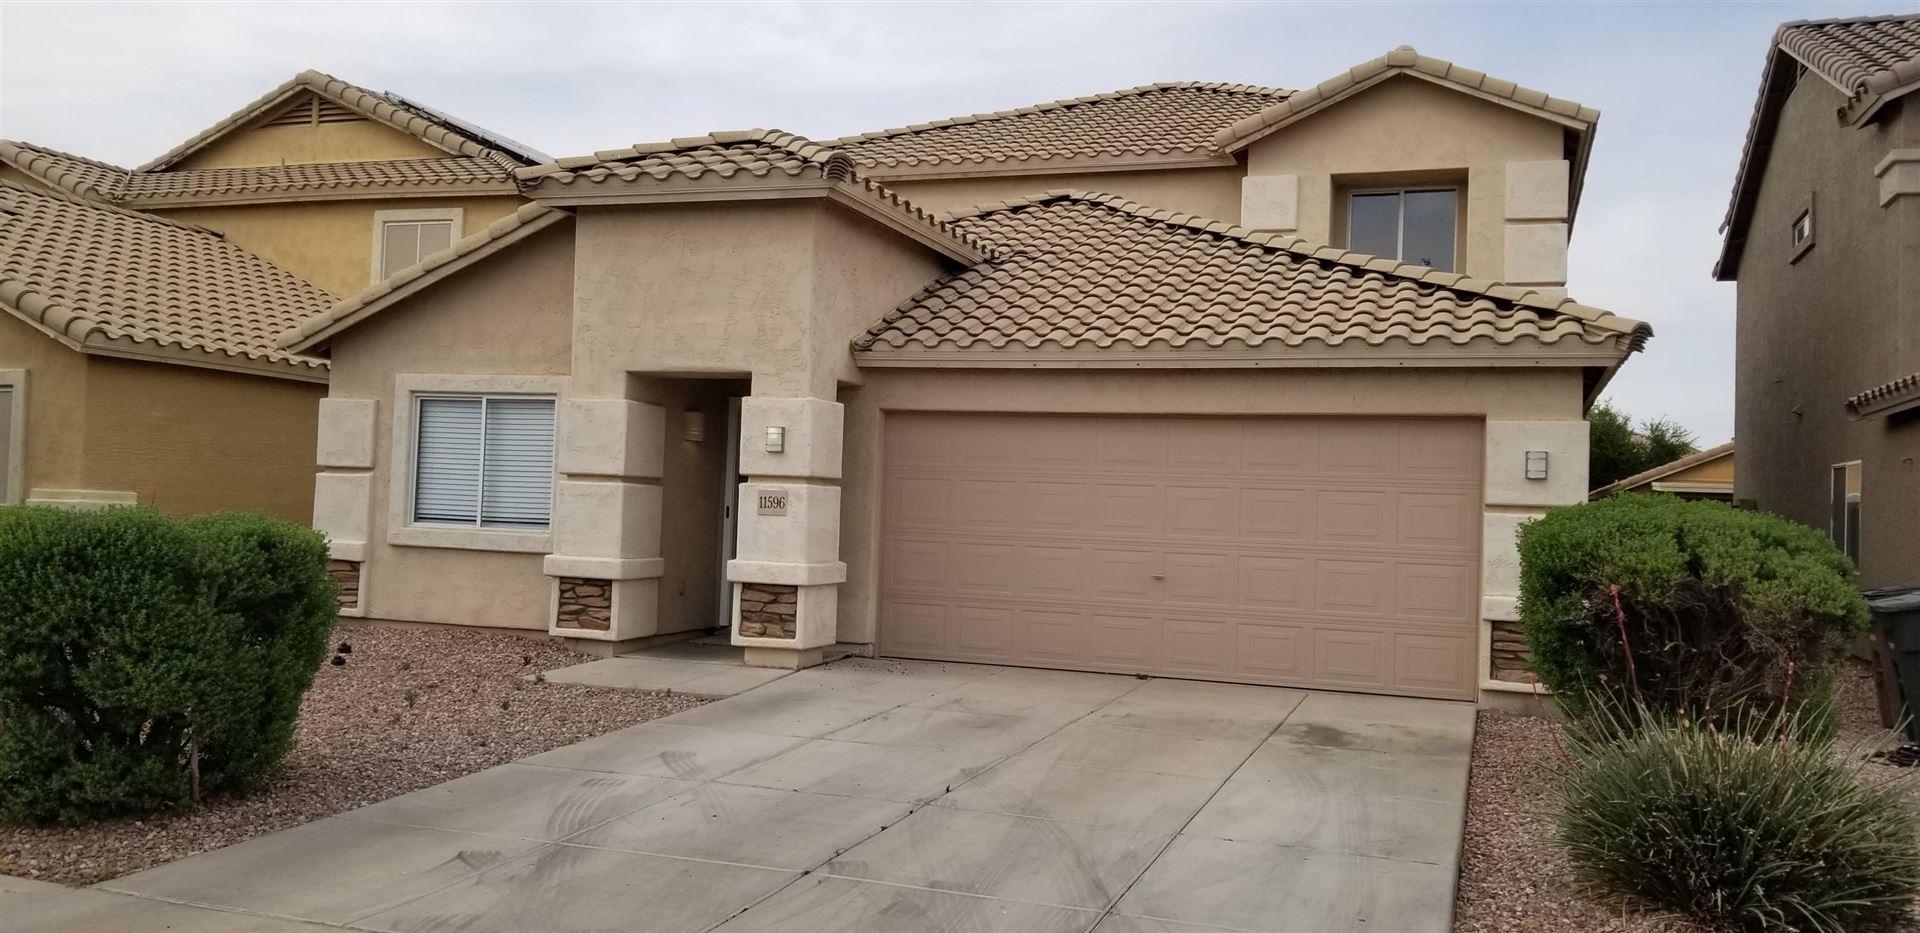 Photo of 11596 W CHERYL Drive, Youngtown, AZ 85363 (MLS # 6221560)